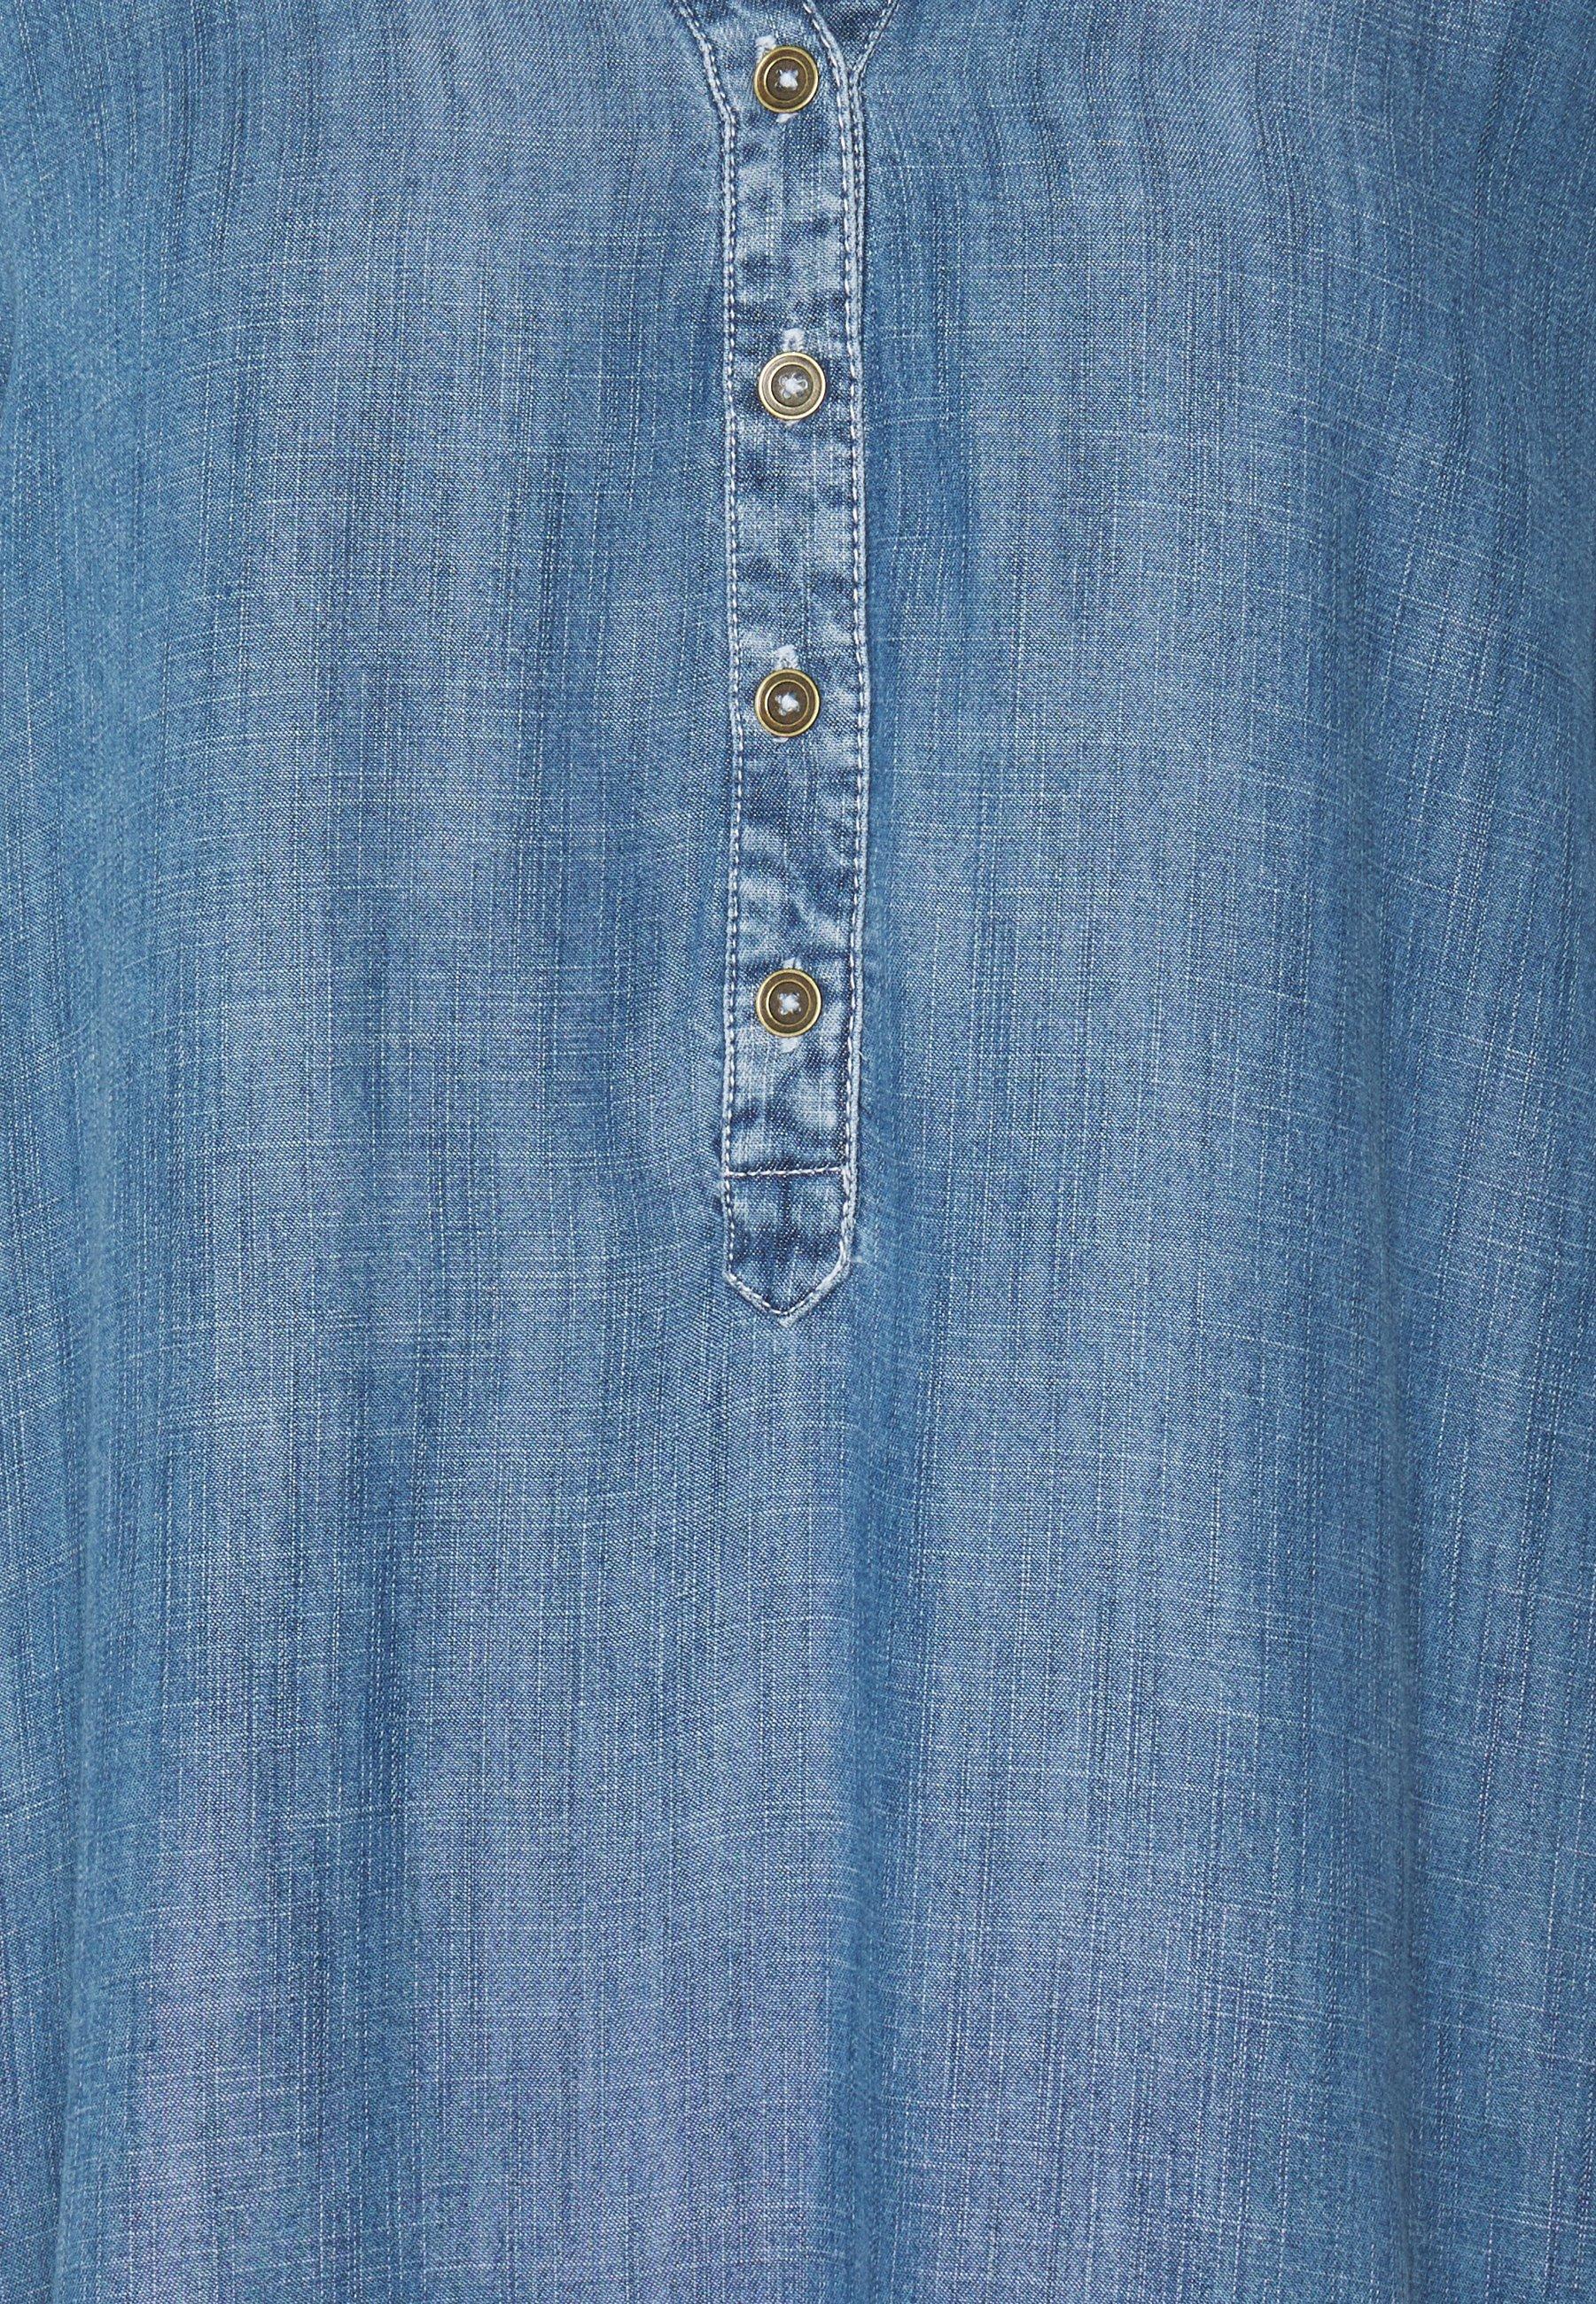 edc by Esprit BLOUSE - Blouse - blue medium wash - Tops & T-shirts Femme eq61x